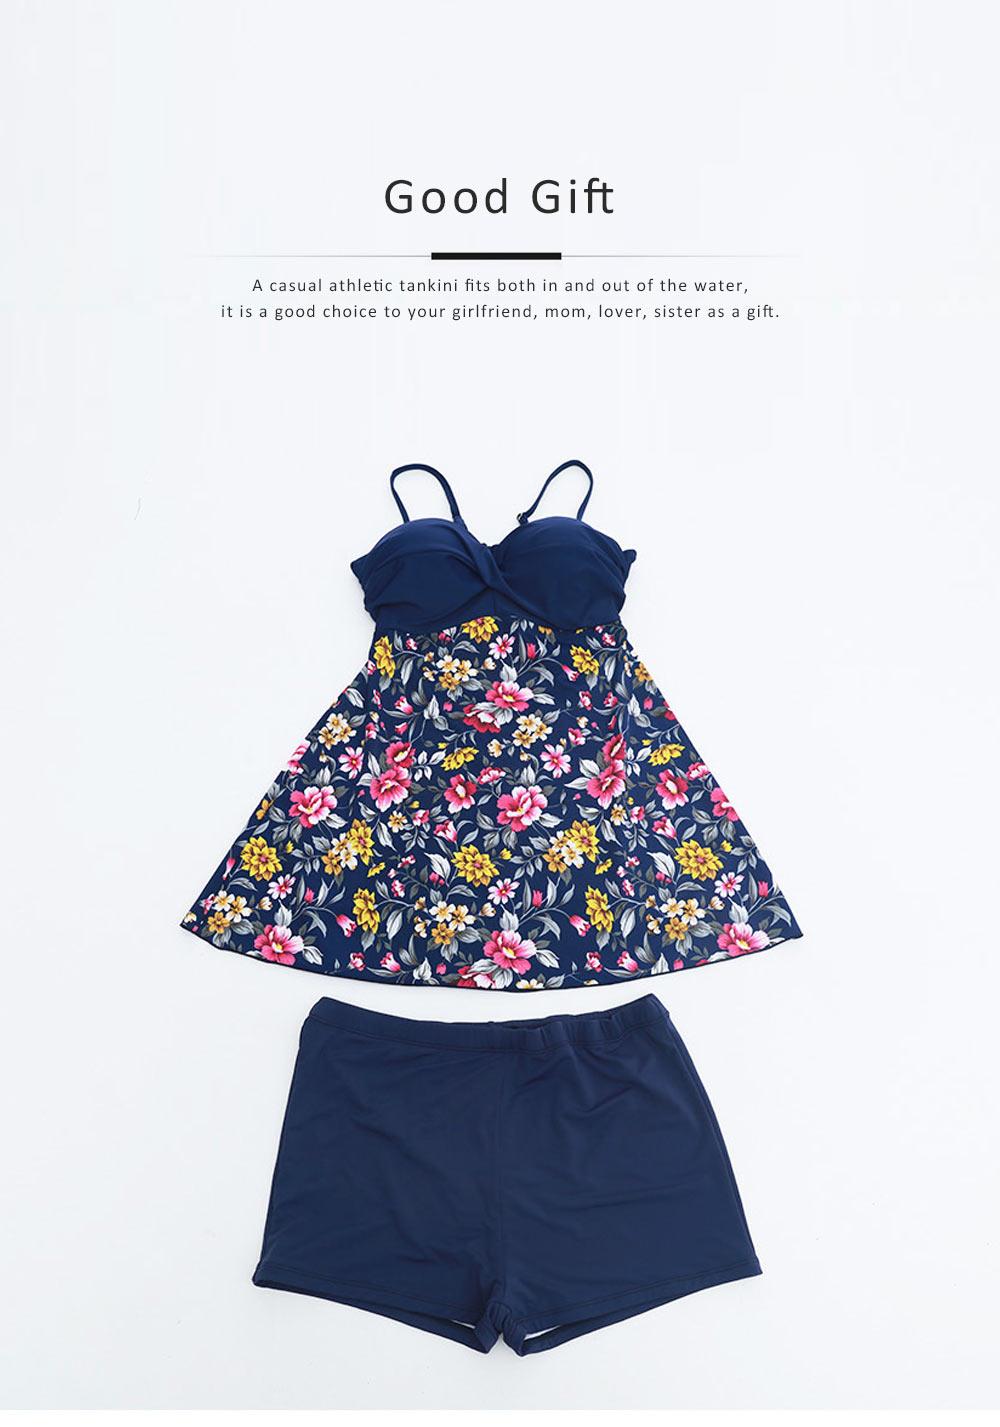 Women Floral Tankini Tummy Control Swimwear Tank Top Retro Printed Swimsuit with Boyshorts Two Piece Bathing Suit 2